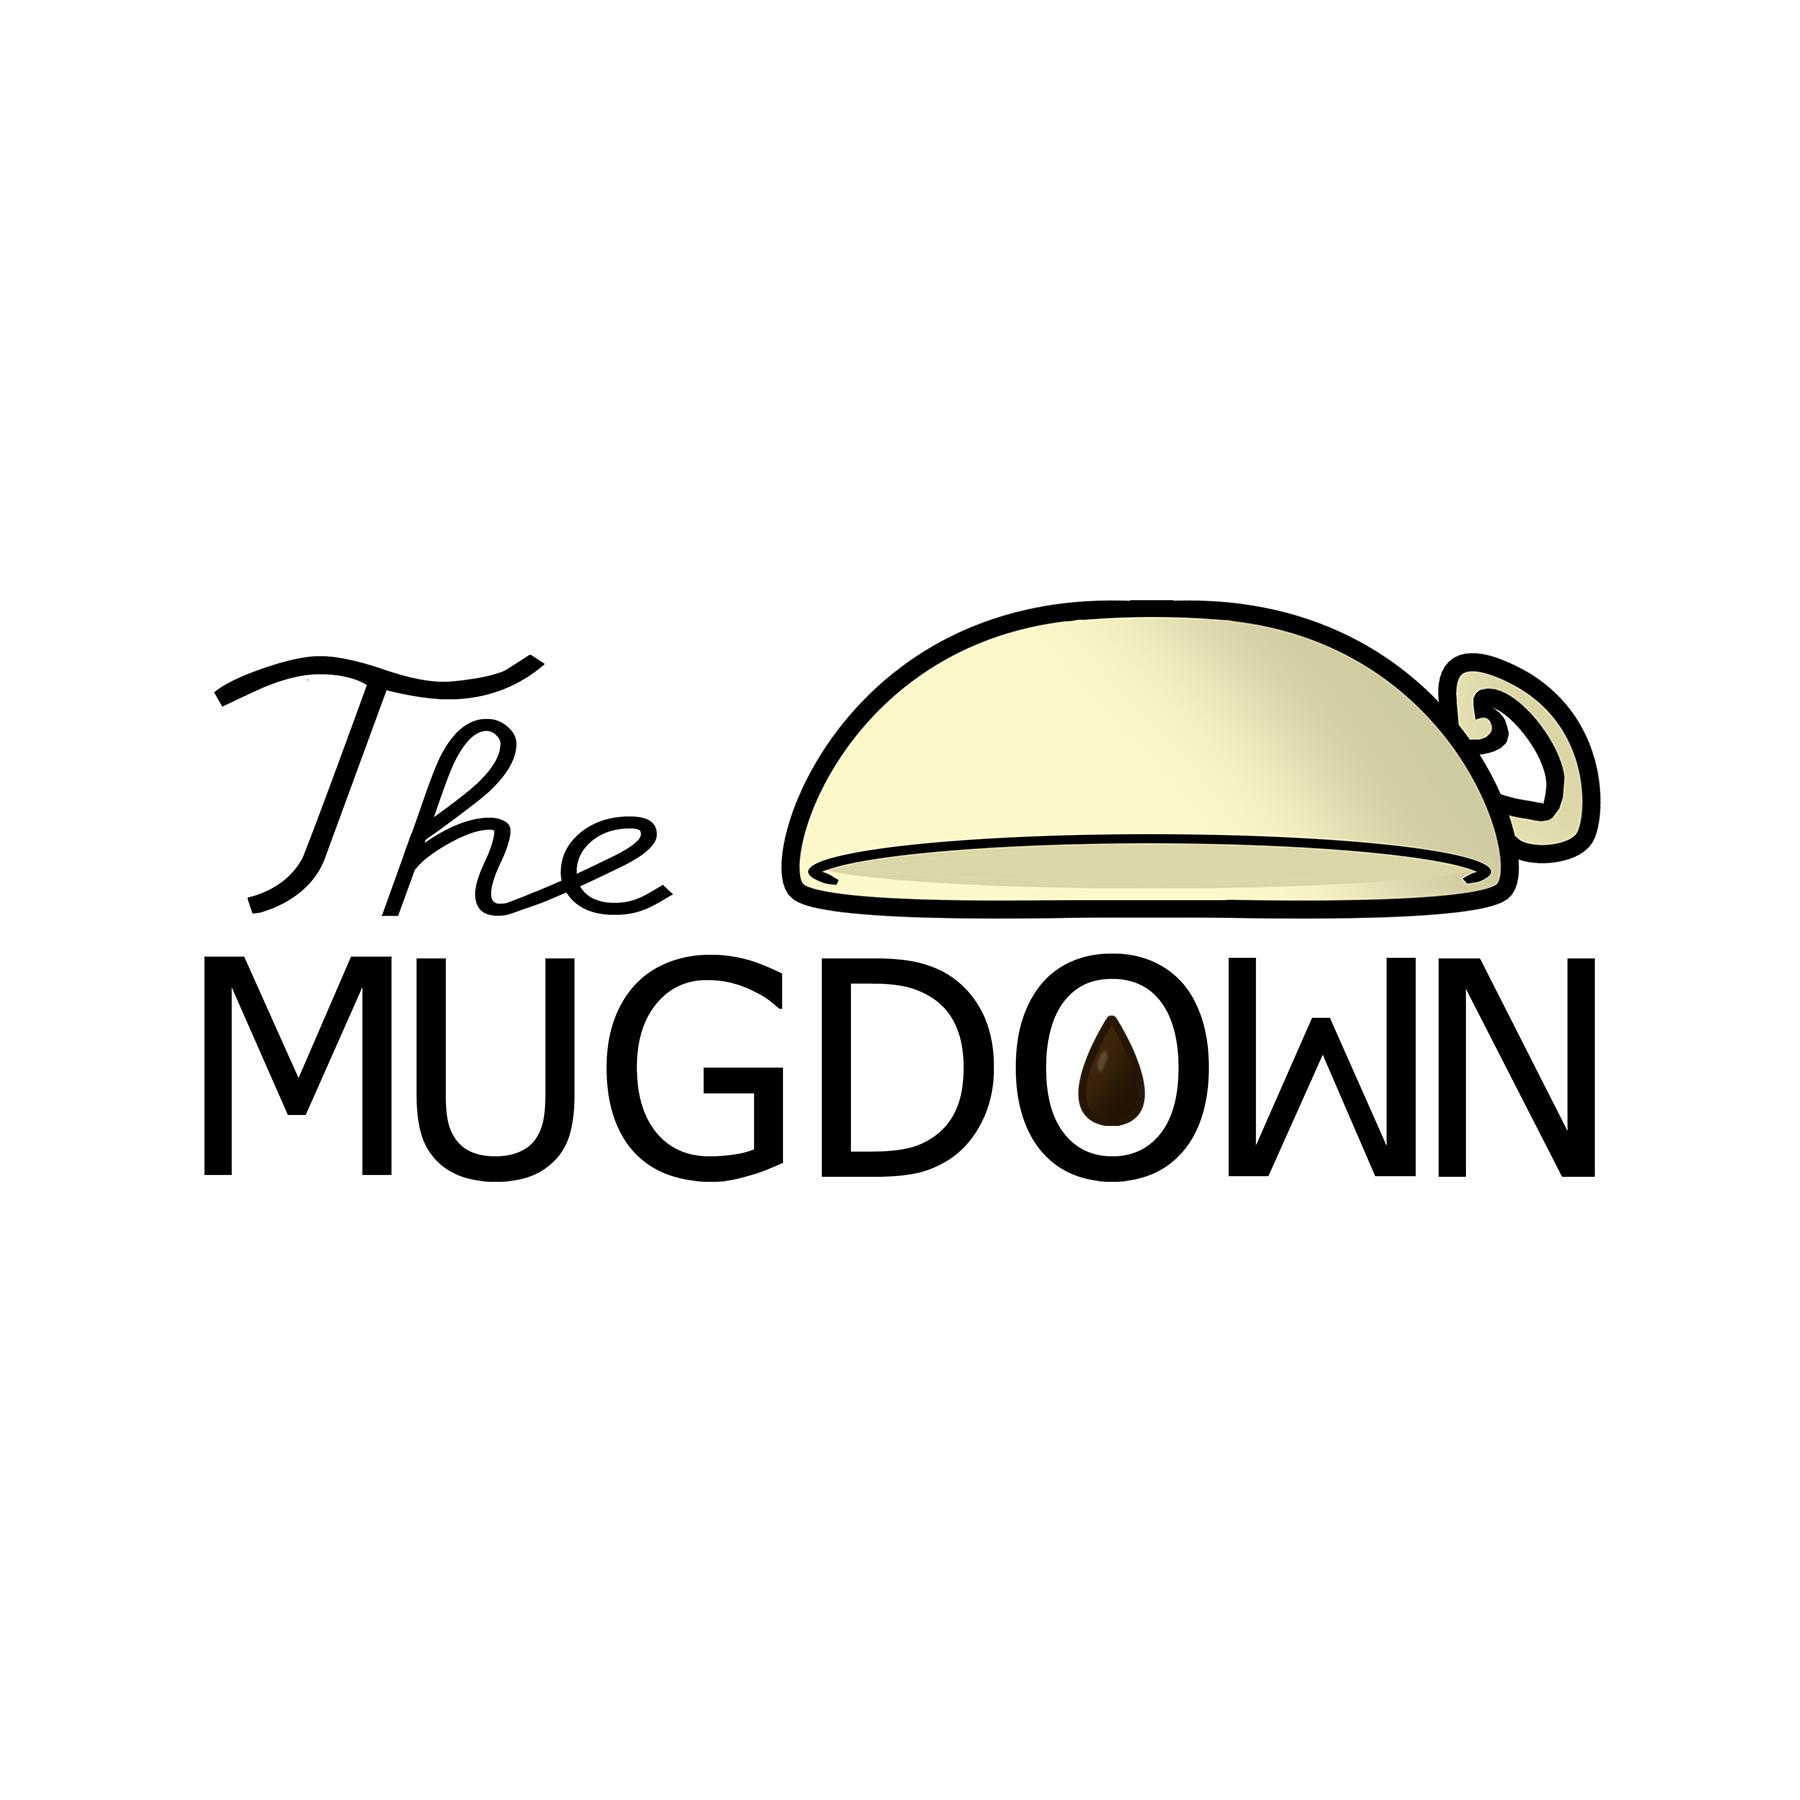 Mugdown Logo - Square.png